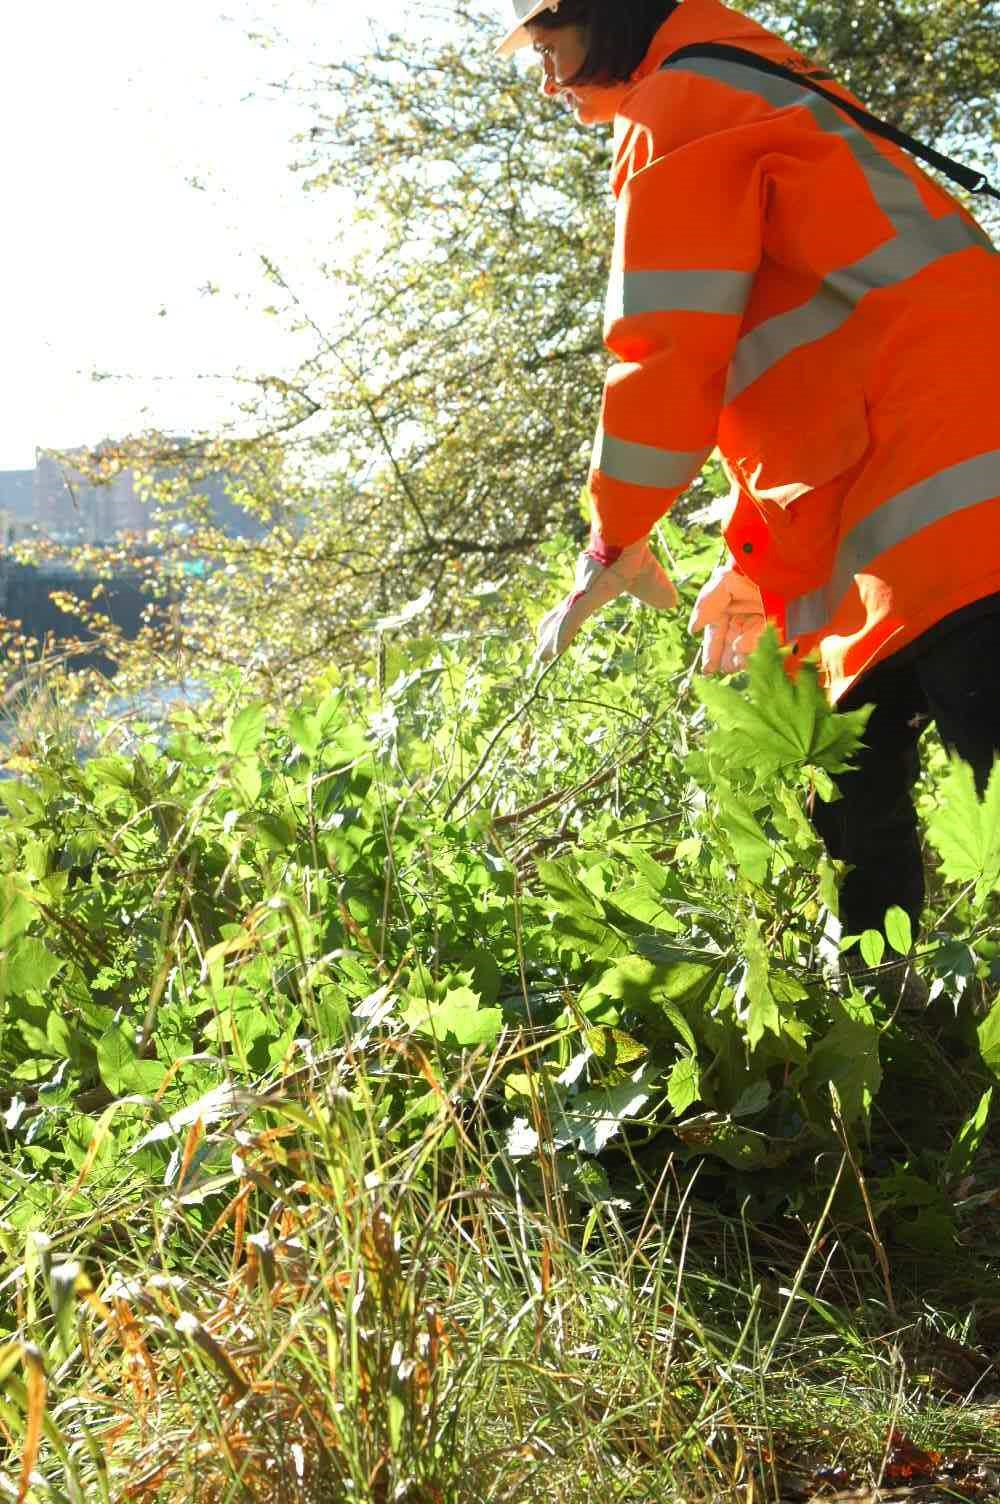 Overgrown vegetation make way for rare plants